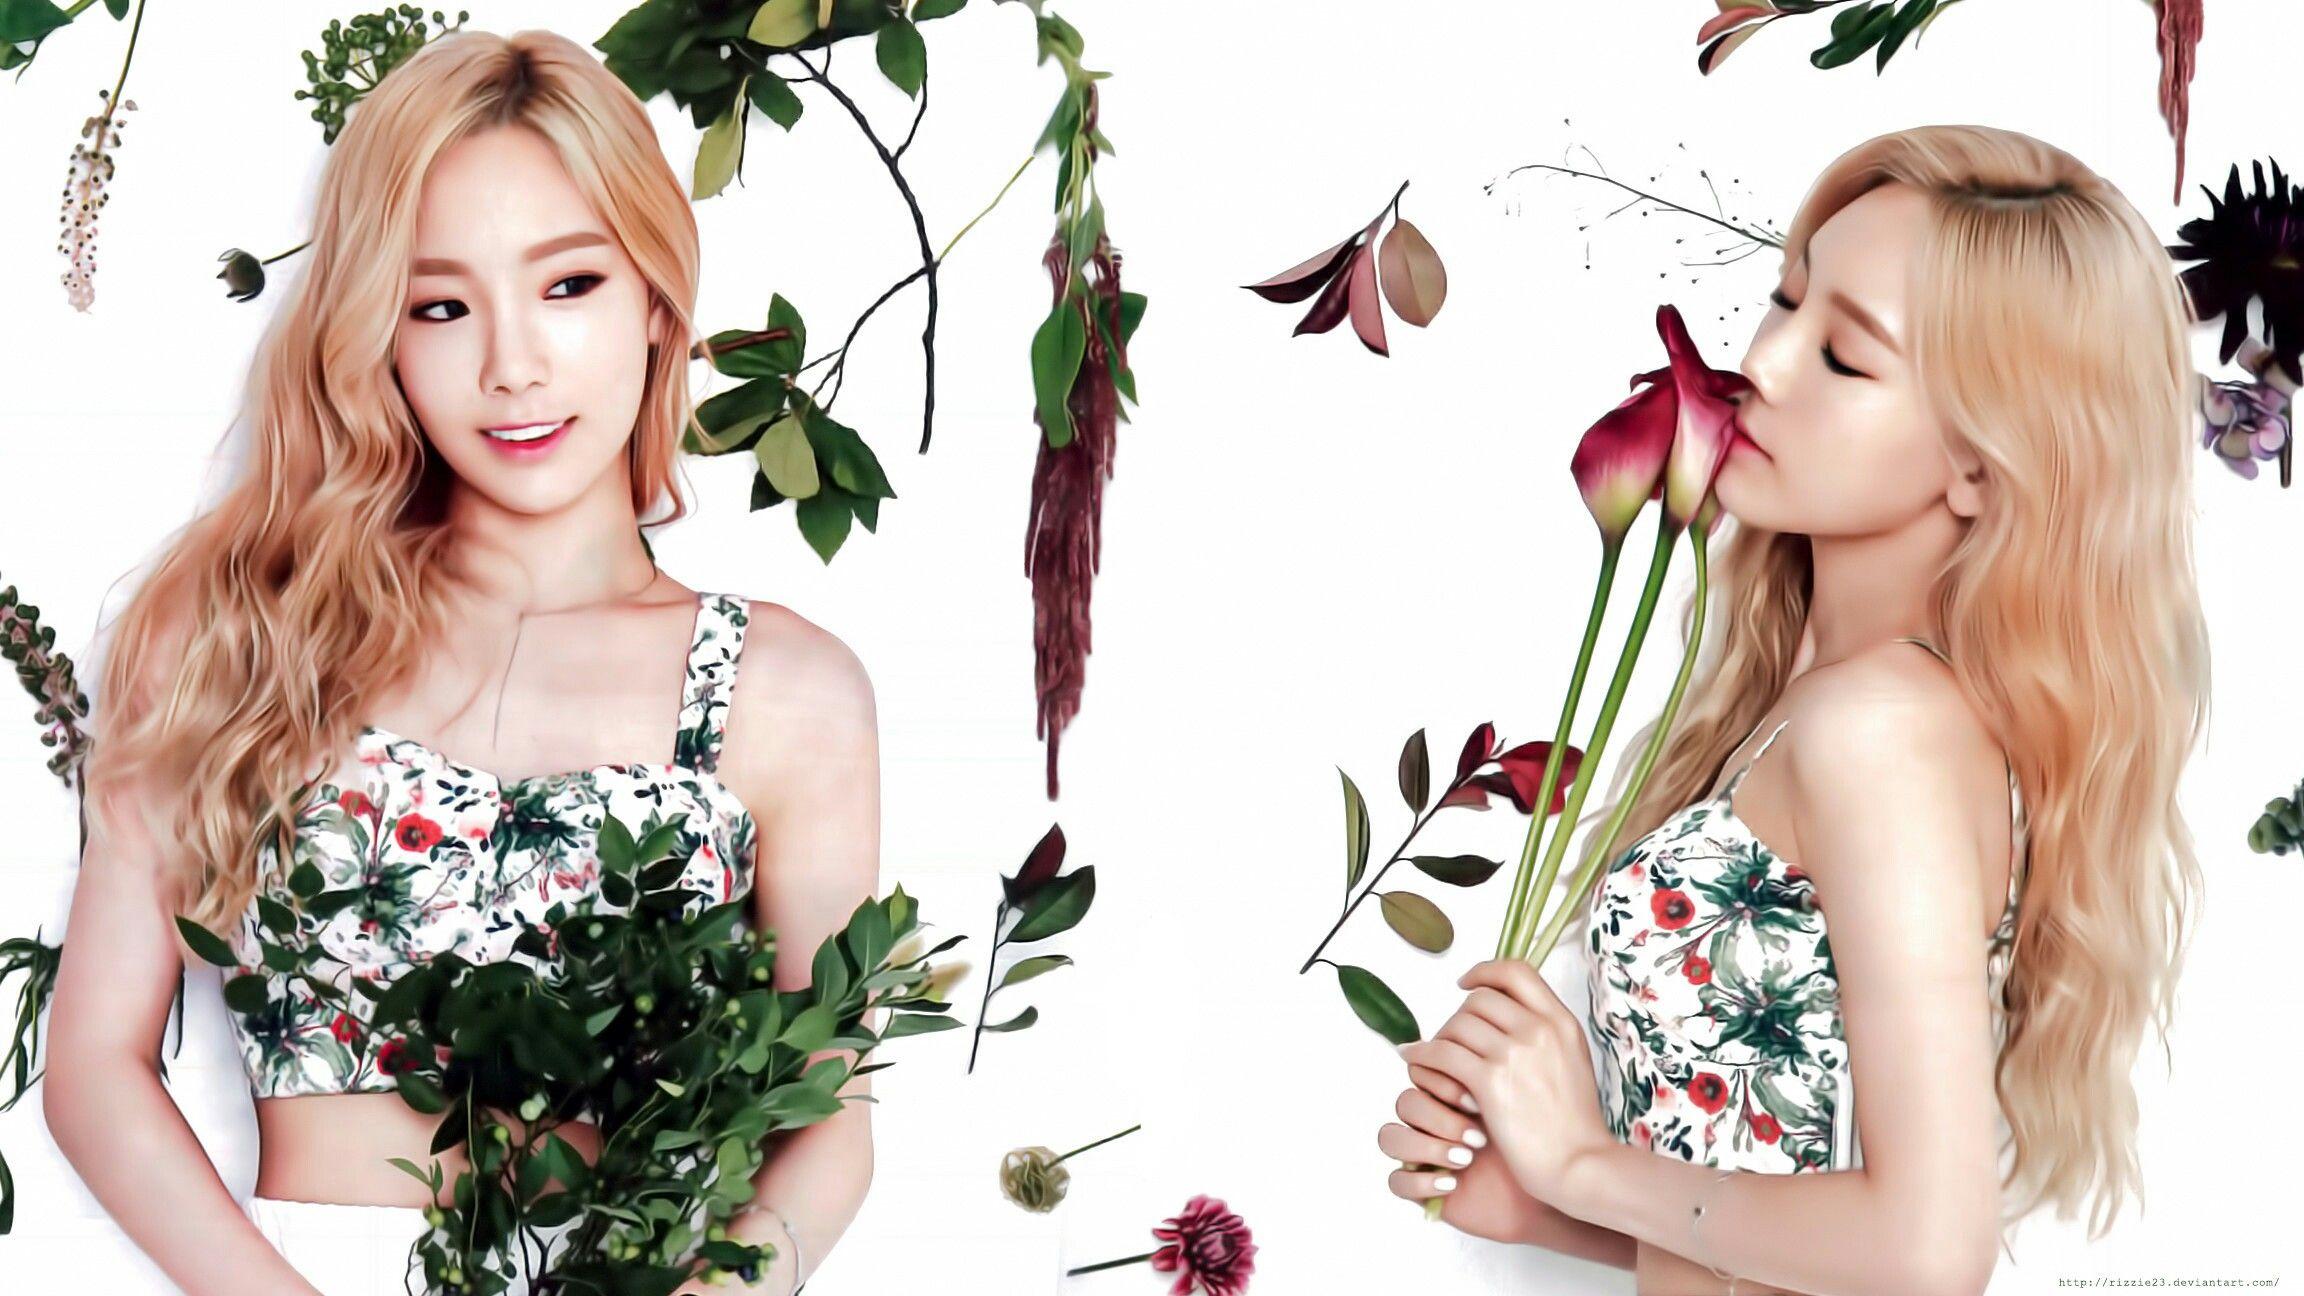 Pin By Yurtsiry Salazar Fernandez On ᴛᴀᴇʏᴇᴏɴ Taeyeon Girls Generation Taeyeon Seasons Greetings